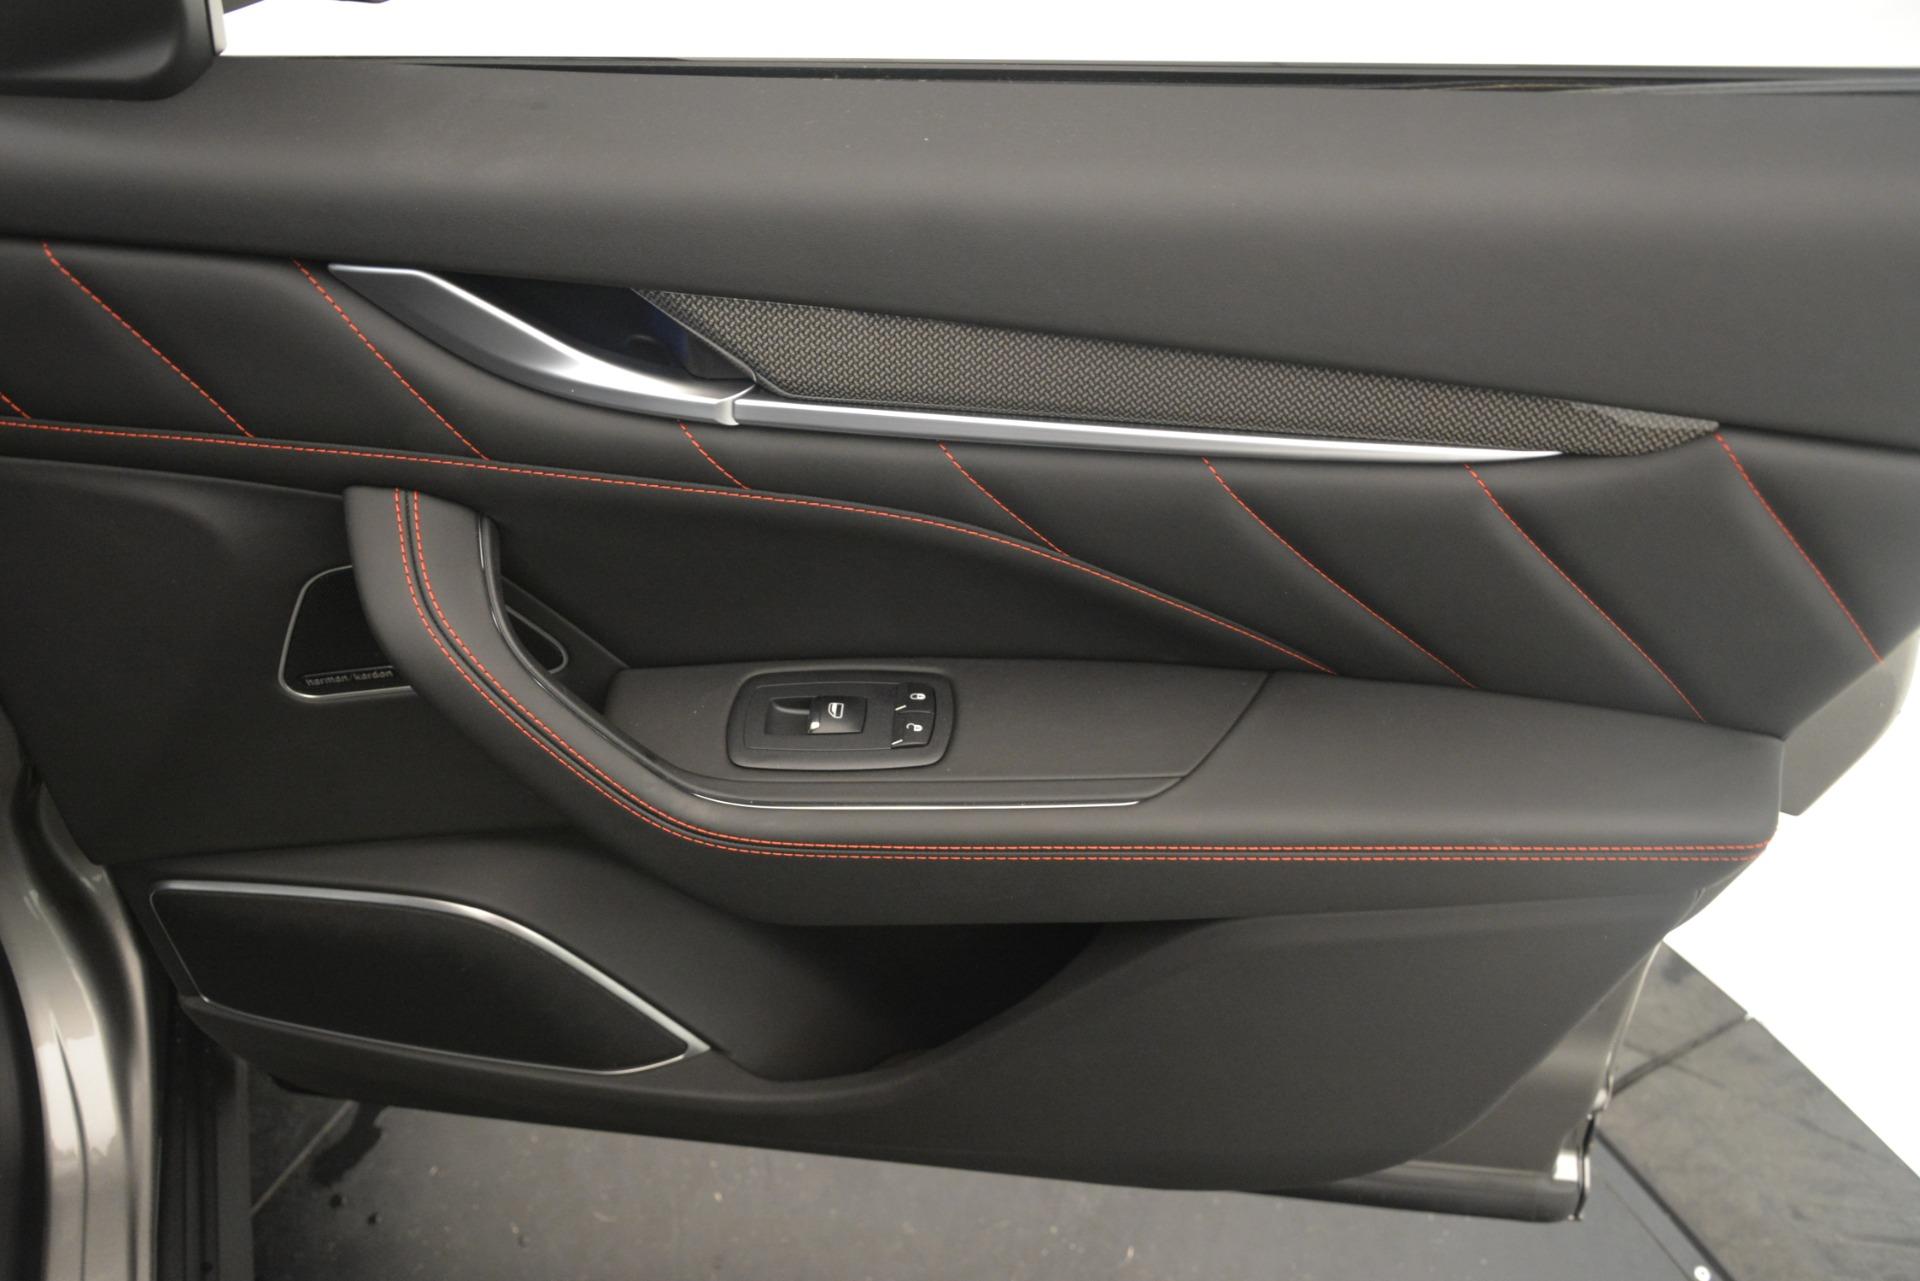 New 2019 Maserati Levante SQ4 GranSport Nerissimo For Sale In Westport, CT 3144_p25